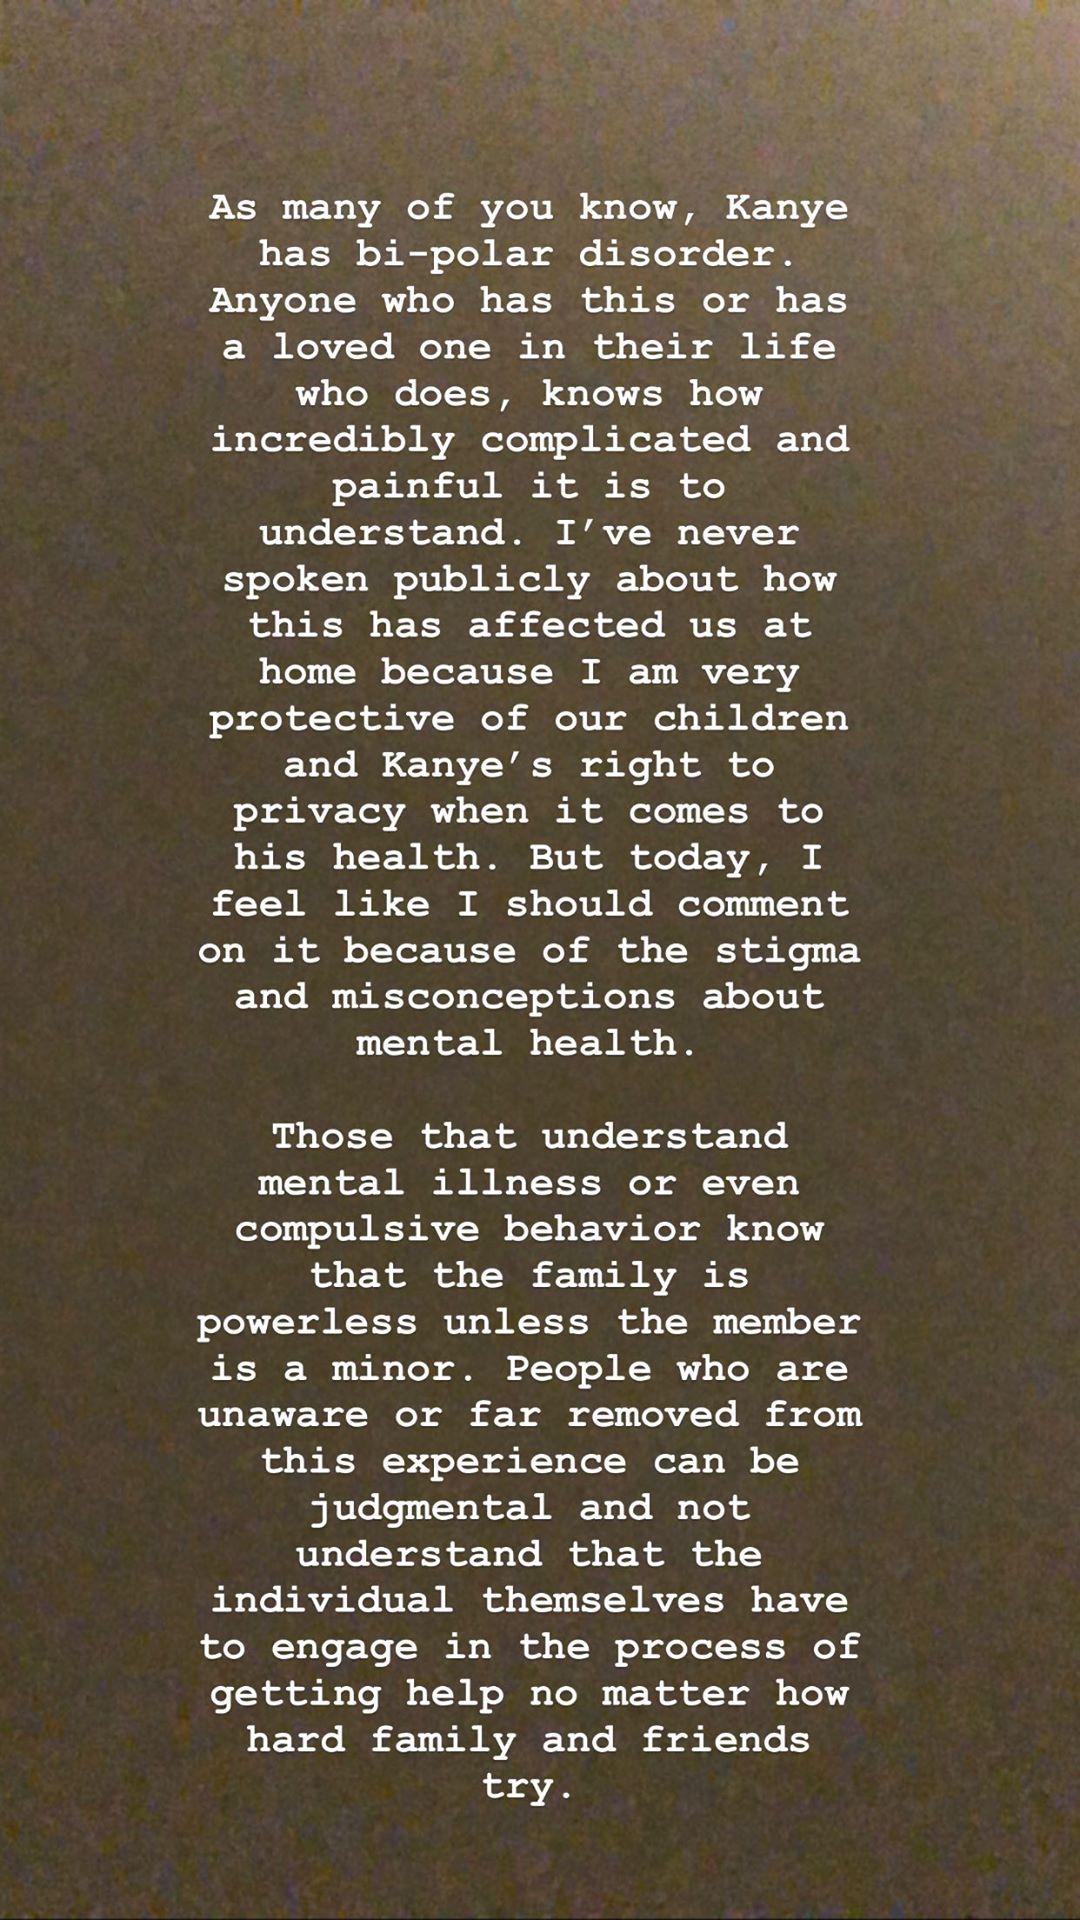 Comunicado de Kim Kardashian sobre la salud mental de Kanye West